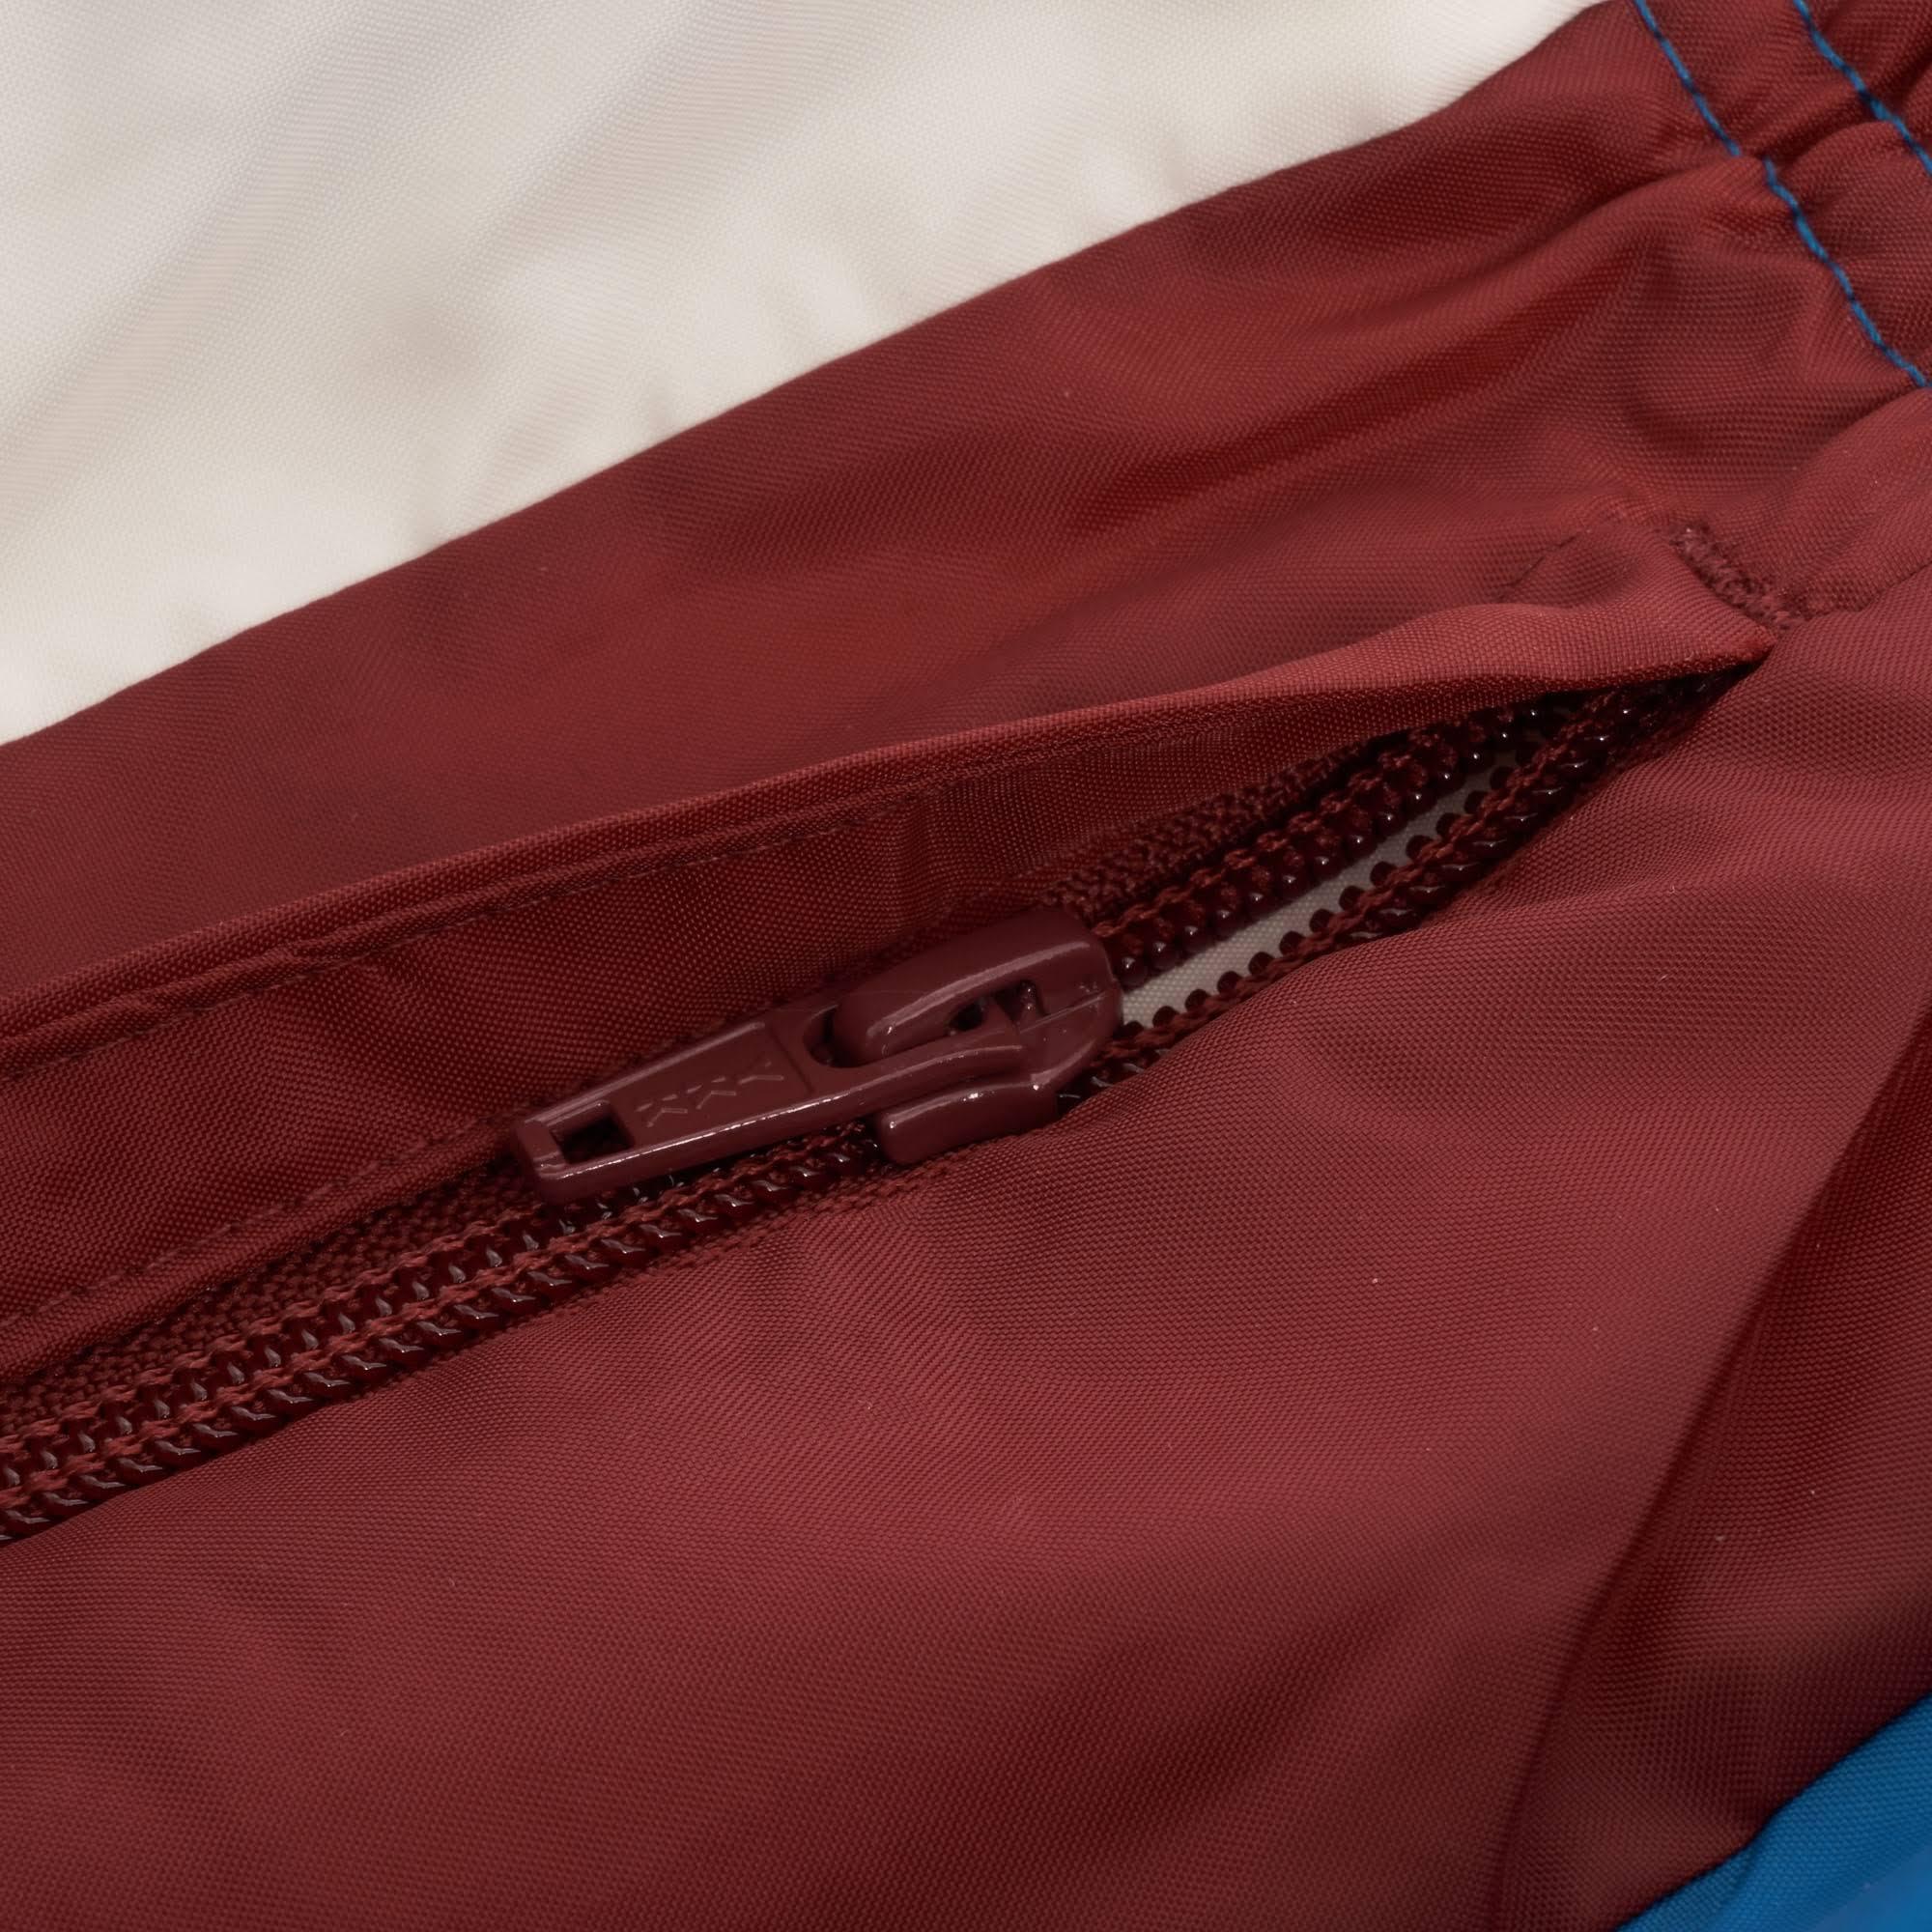 Aq1895301 issue Pants Hombres Nike Verde Re Tamaño M Abismo Woven 7qRwaUxX